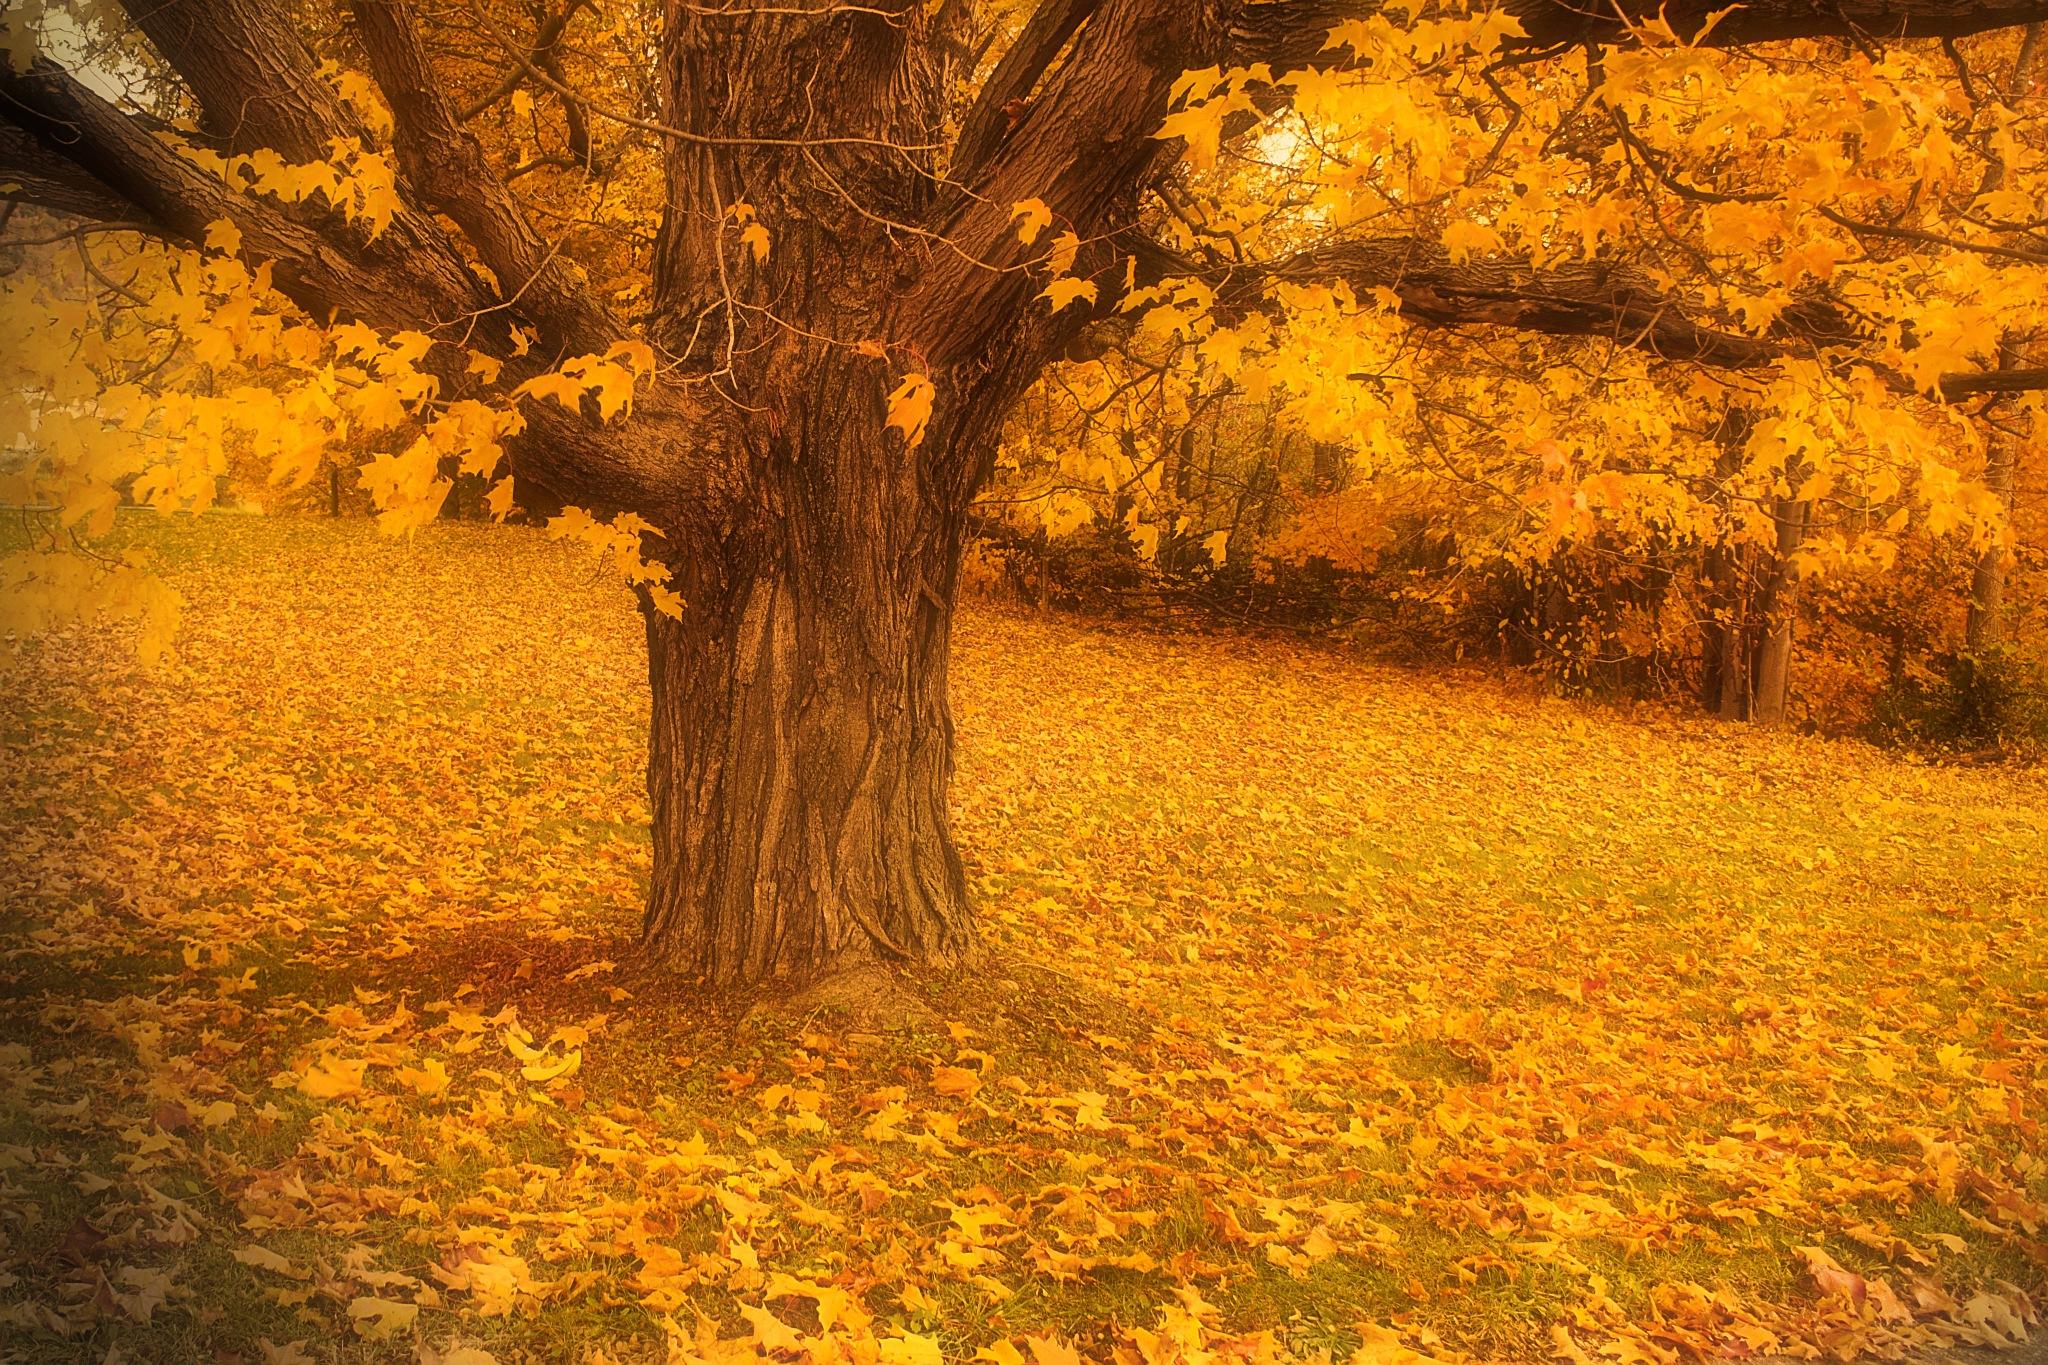 Fall Gold  by Scott